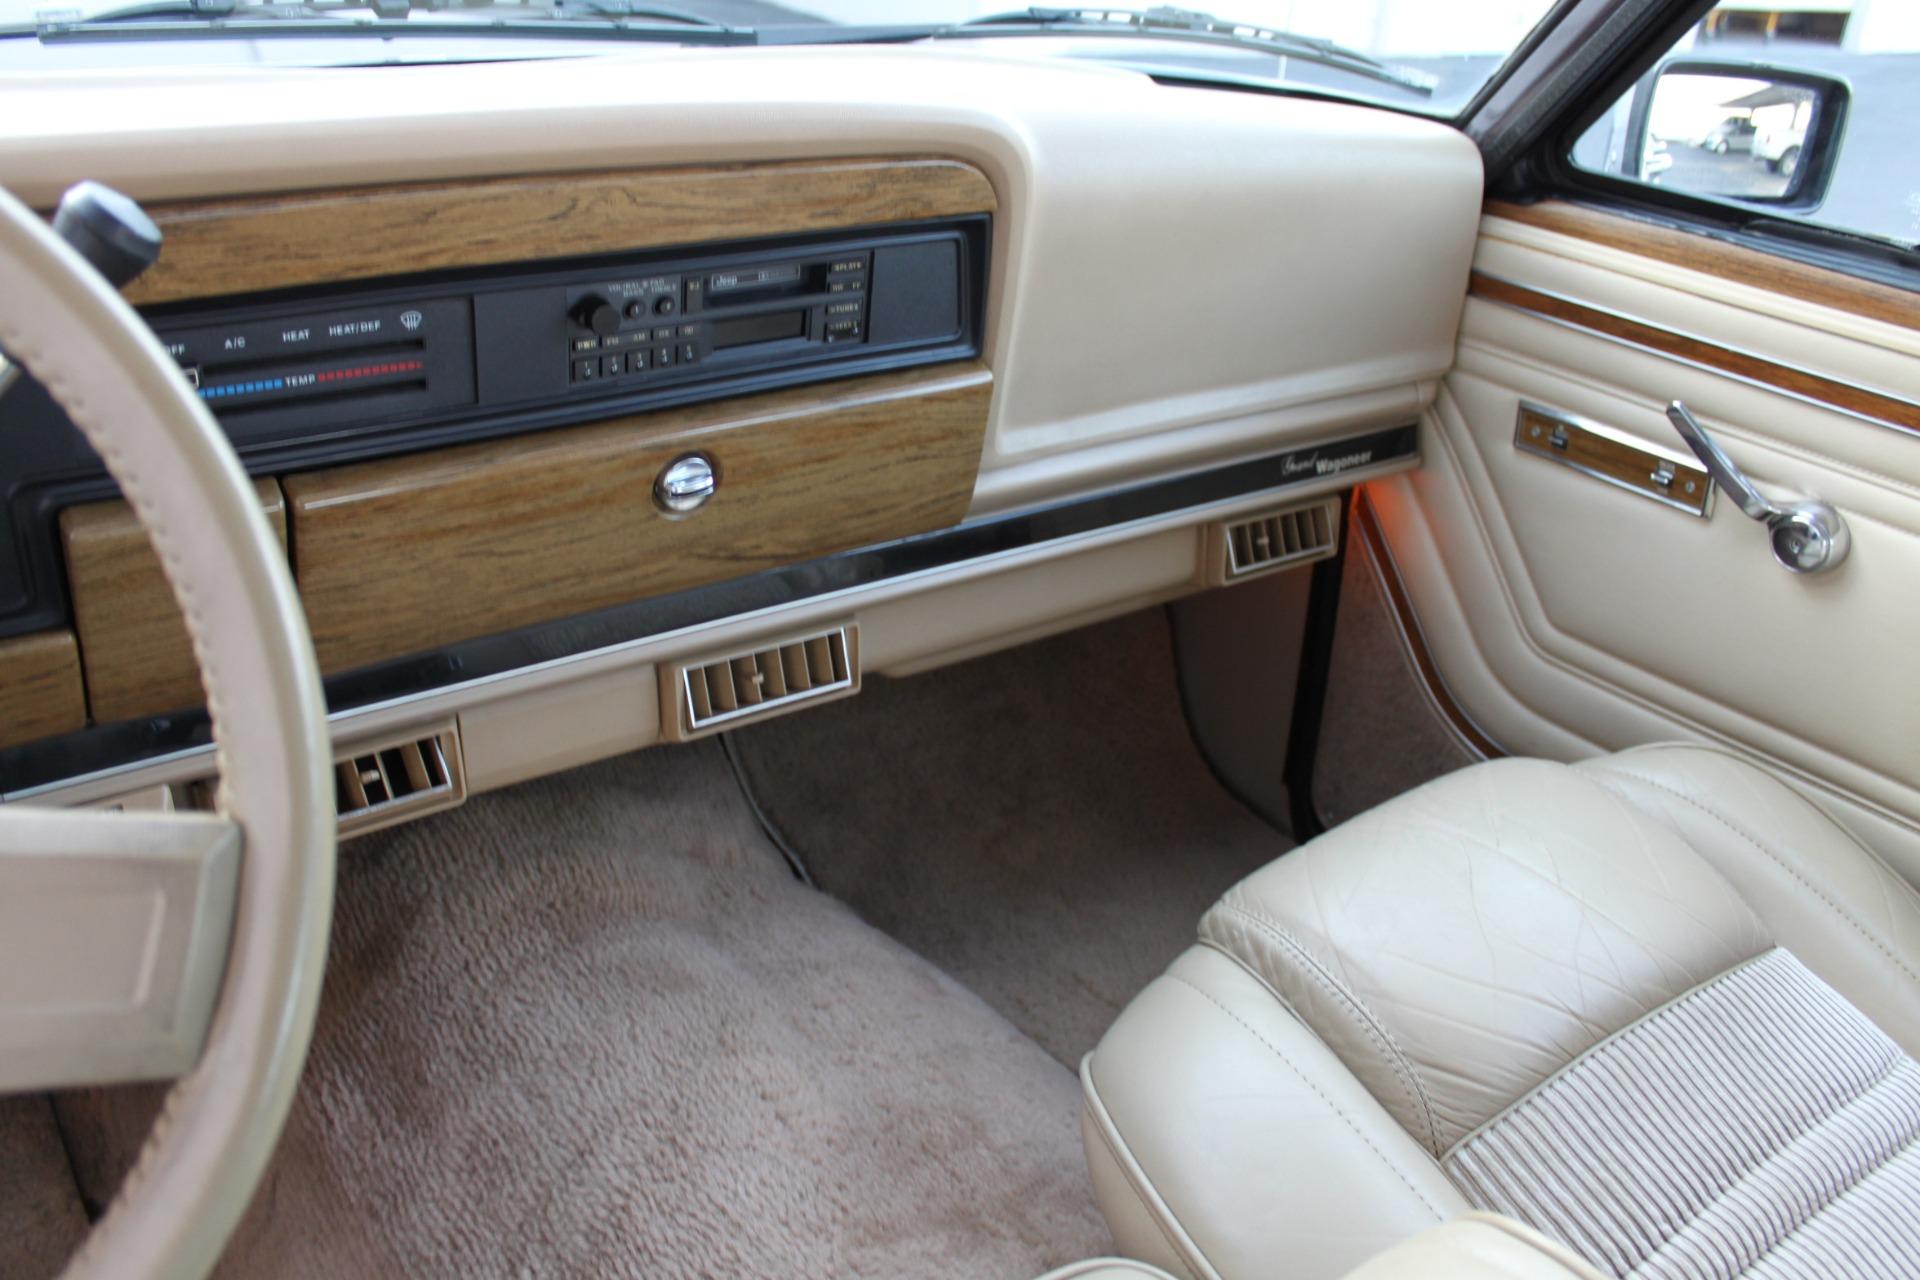 Used-1990-Jeep-Grand-Wagoneer-4X4-Ford